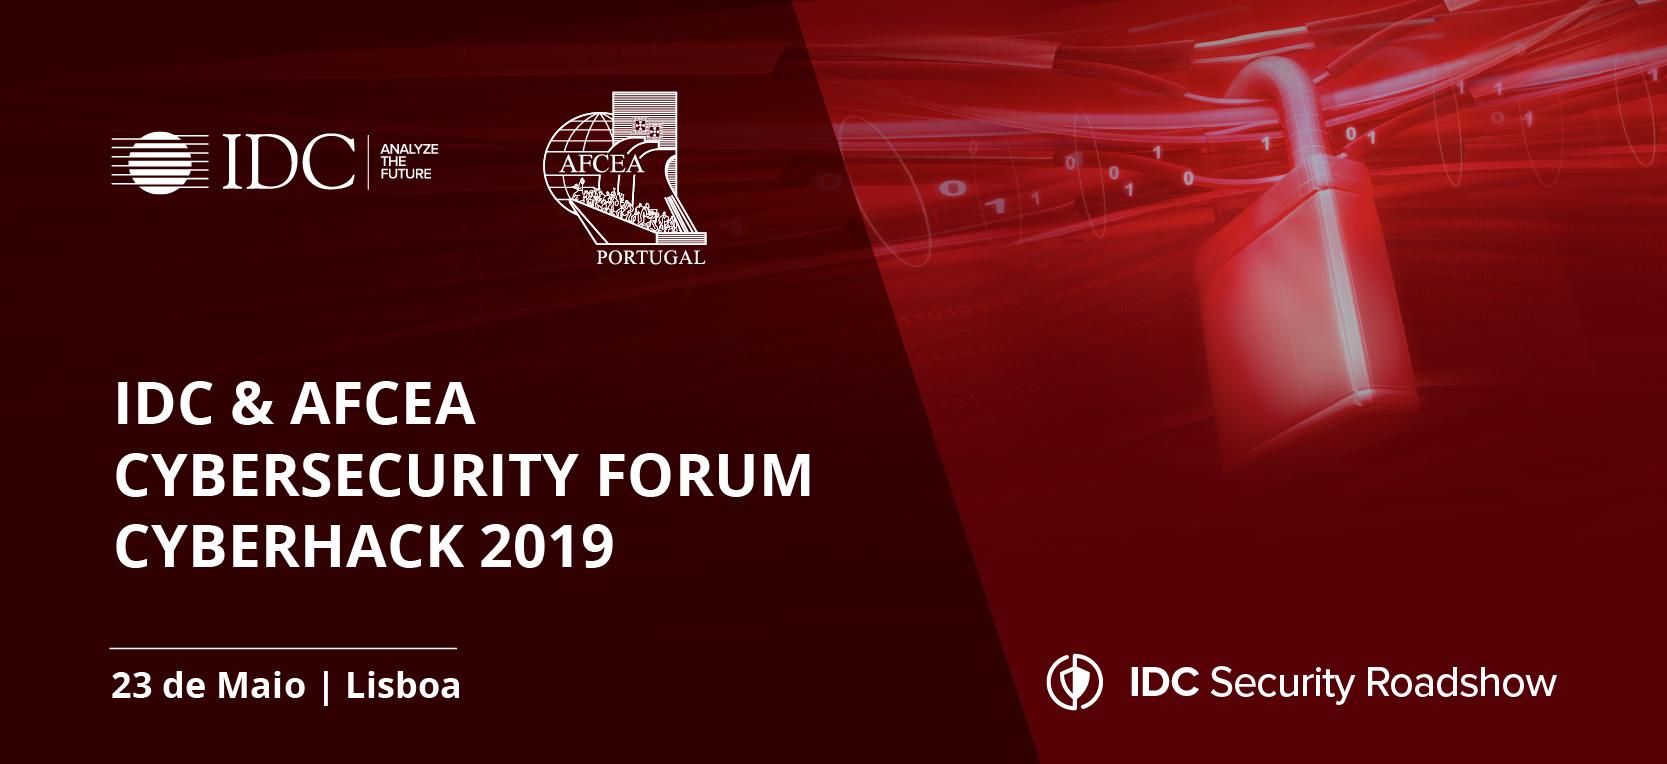 IDC & AFCEA CYBERSECURITY FORUM CYBERHACK 2019